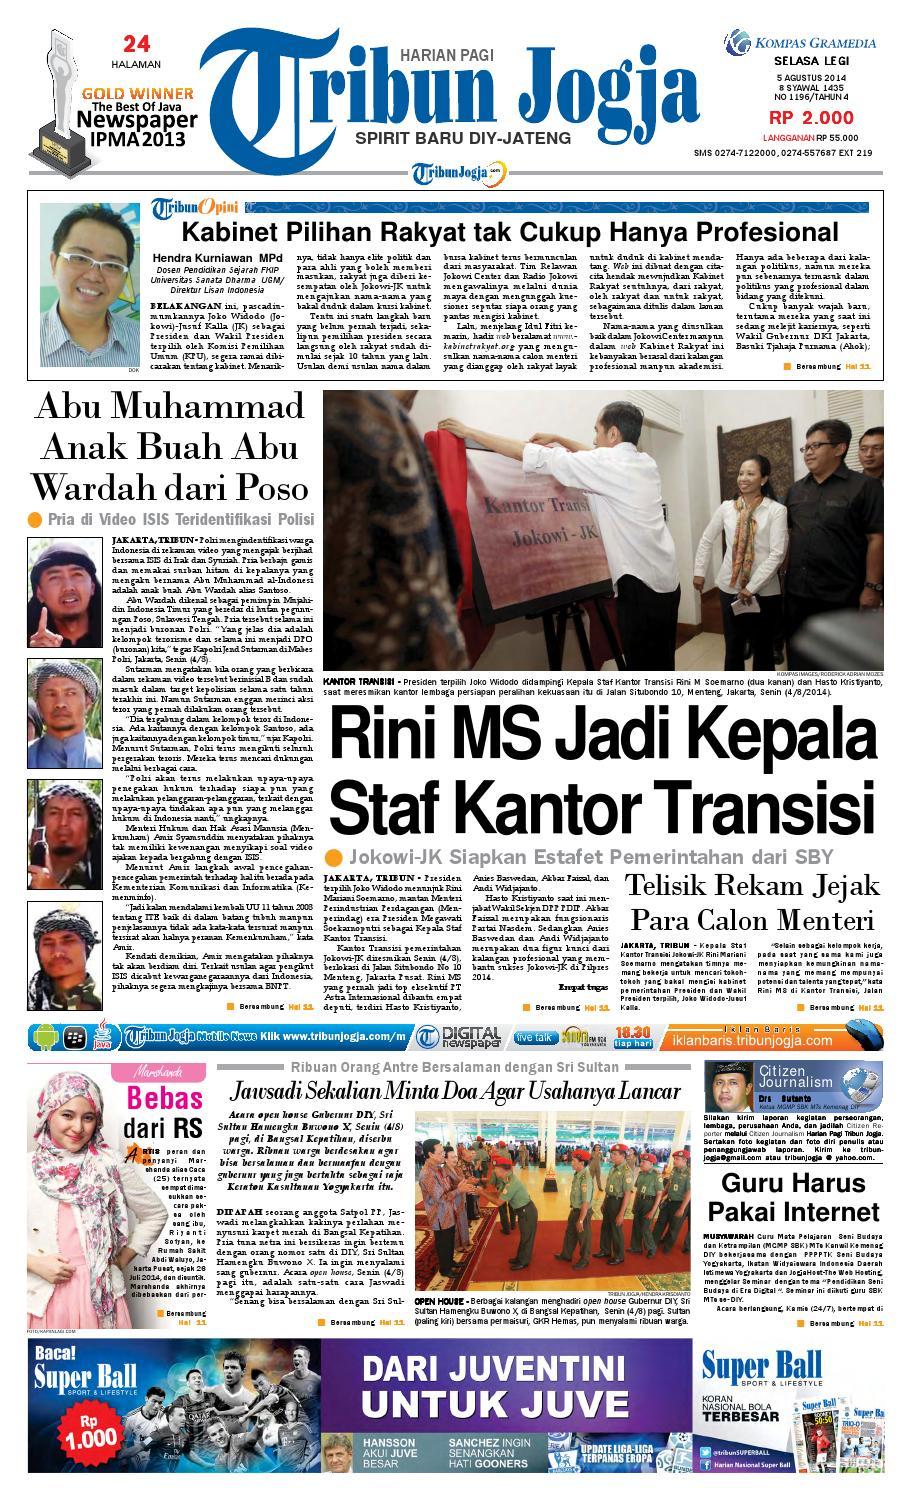 Tribunjogja 05 08 2014 By Tribun Jogja Issuu Produk Ukm Bumn Wisata Mewah Bali 3hr 2mlm